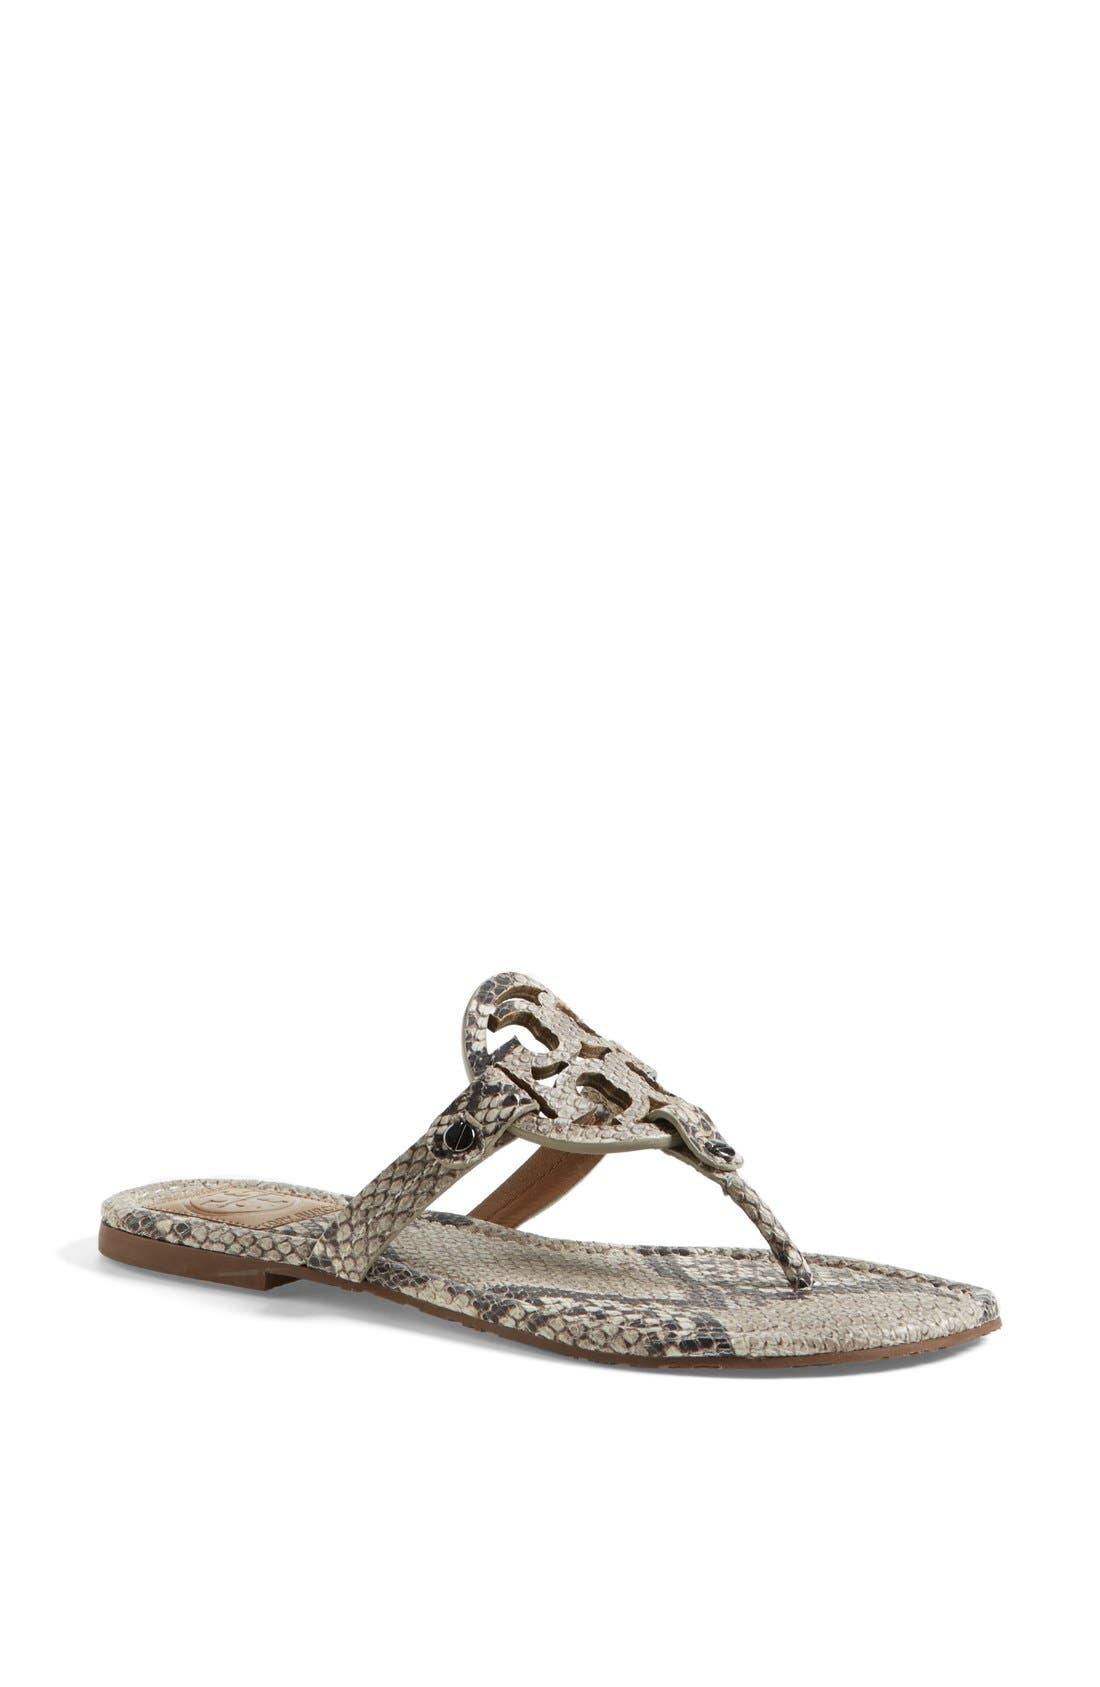 Alternate Image 1 Selected - Tory Burch 'Miller' Sandal